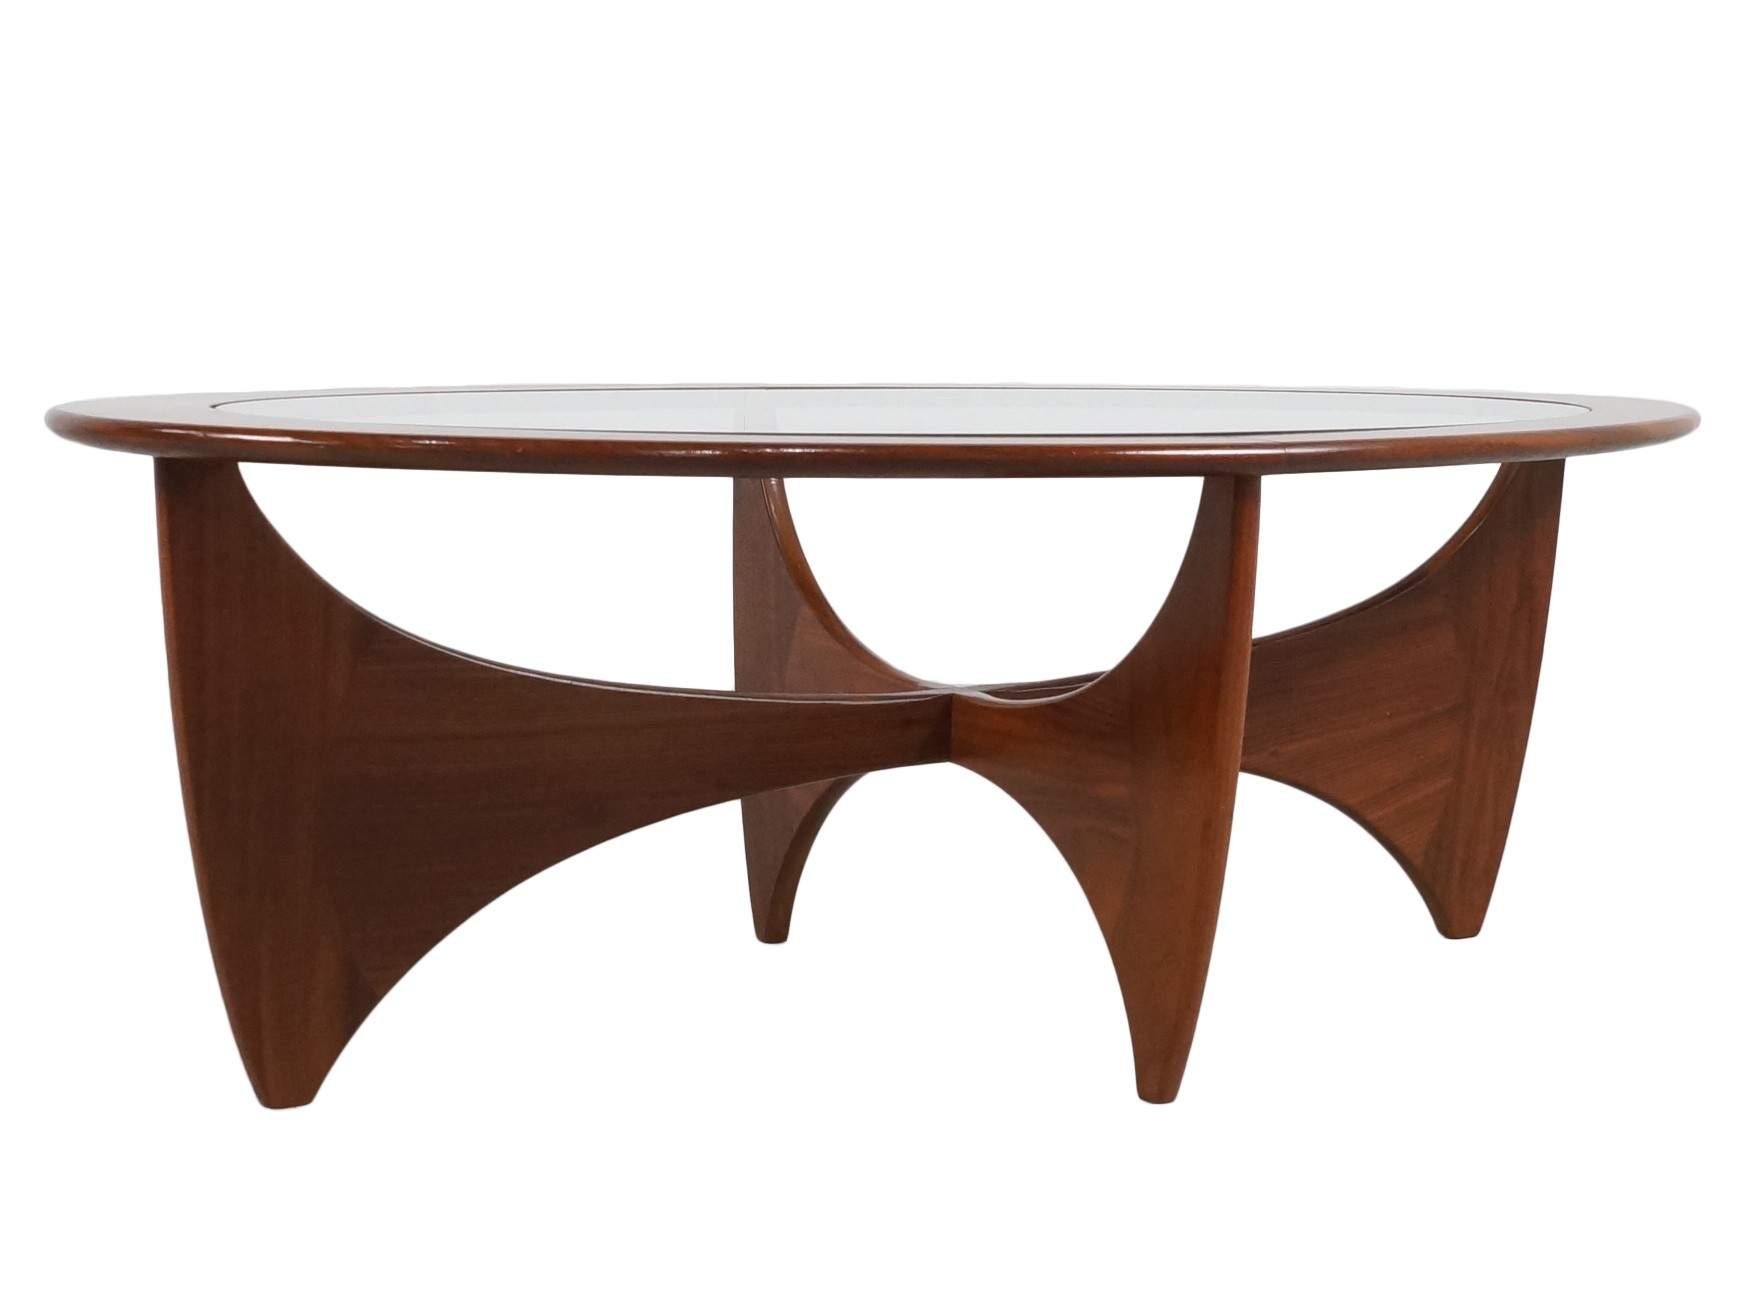 G Plan Astro Teak Oval Coffee Table Victor WILKINS